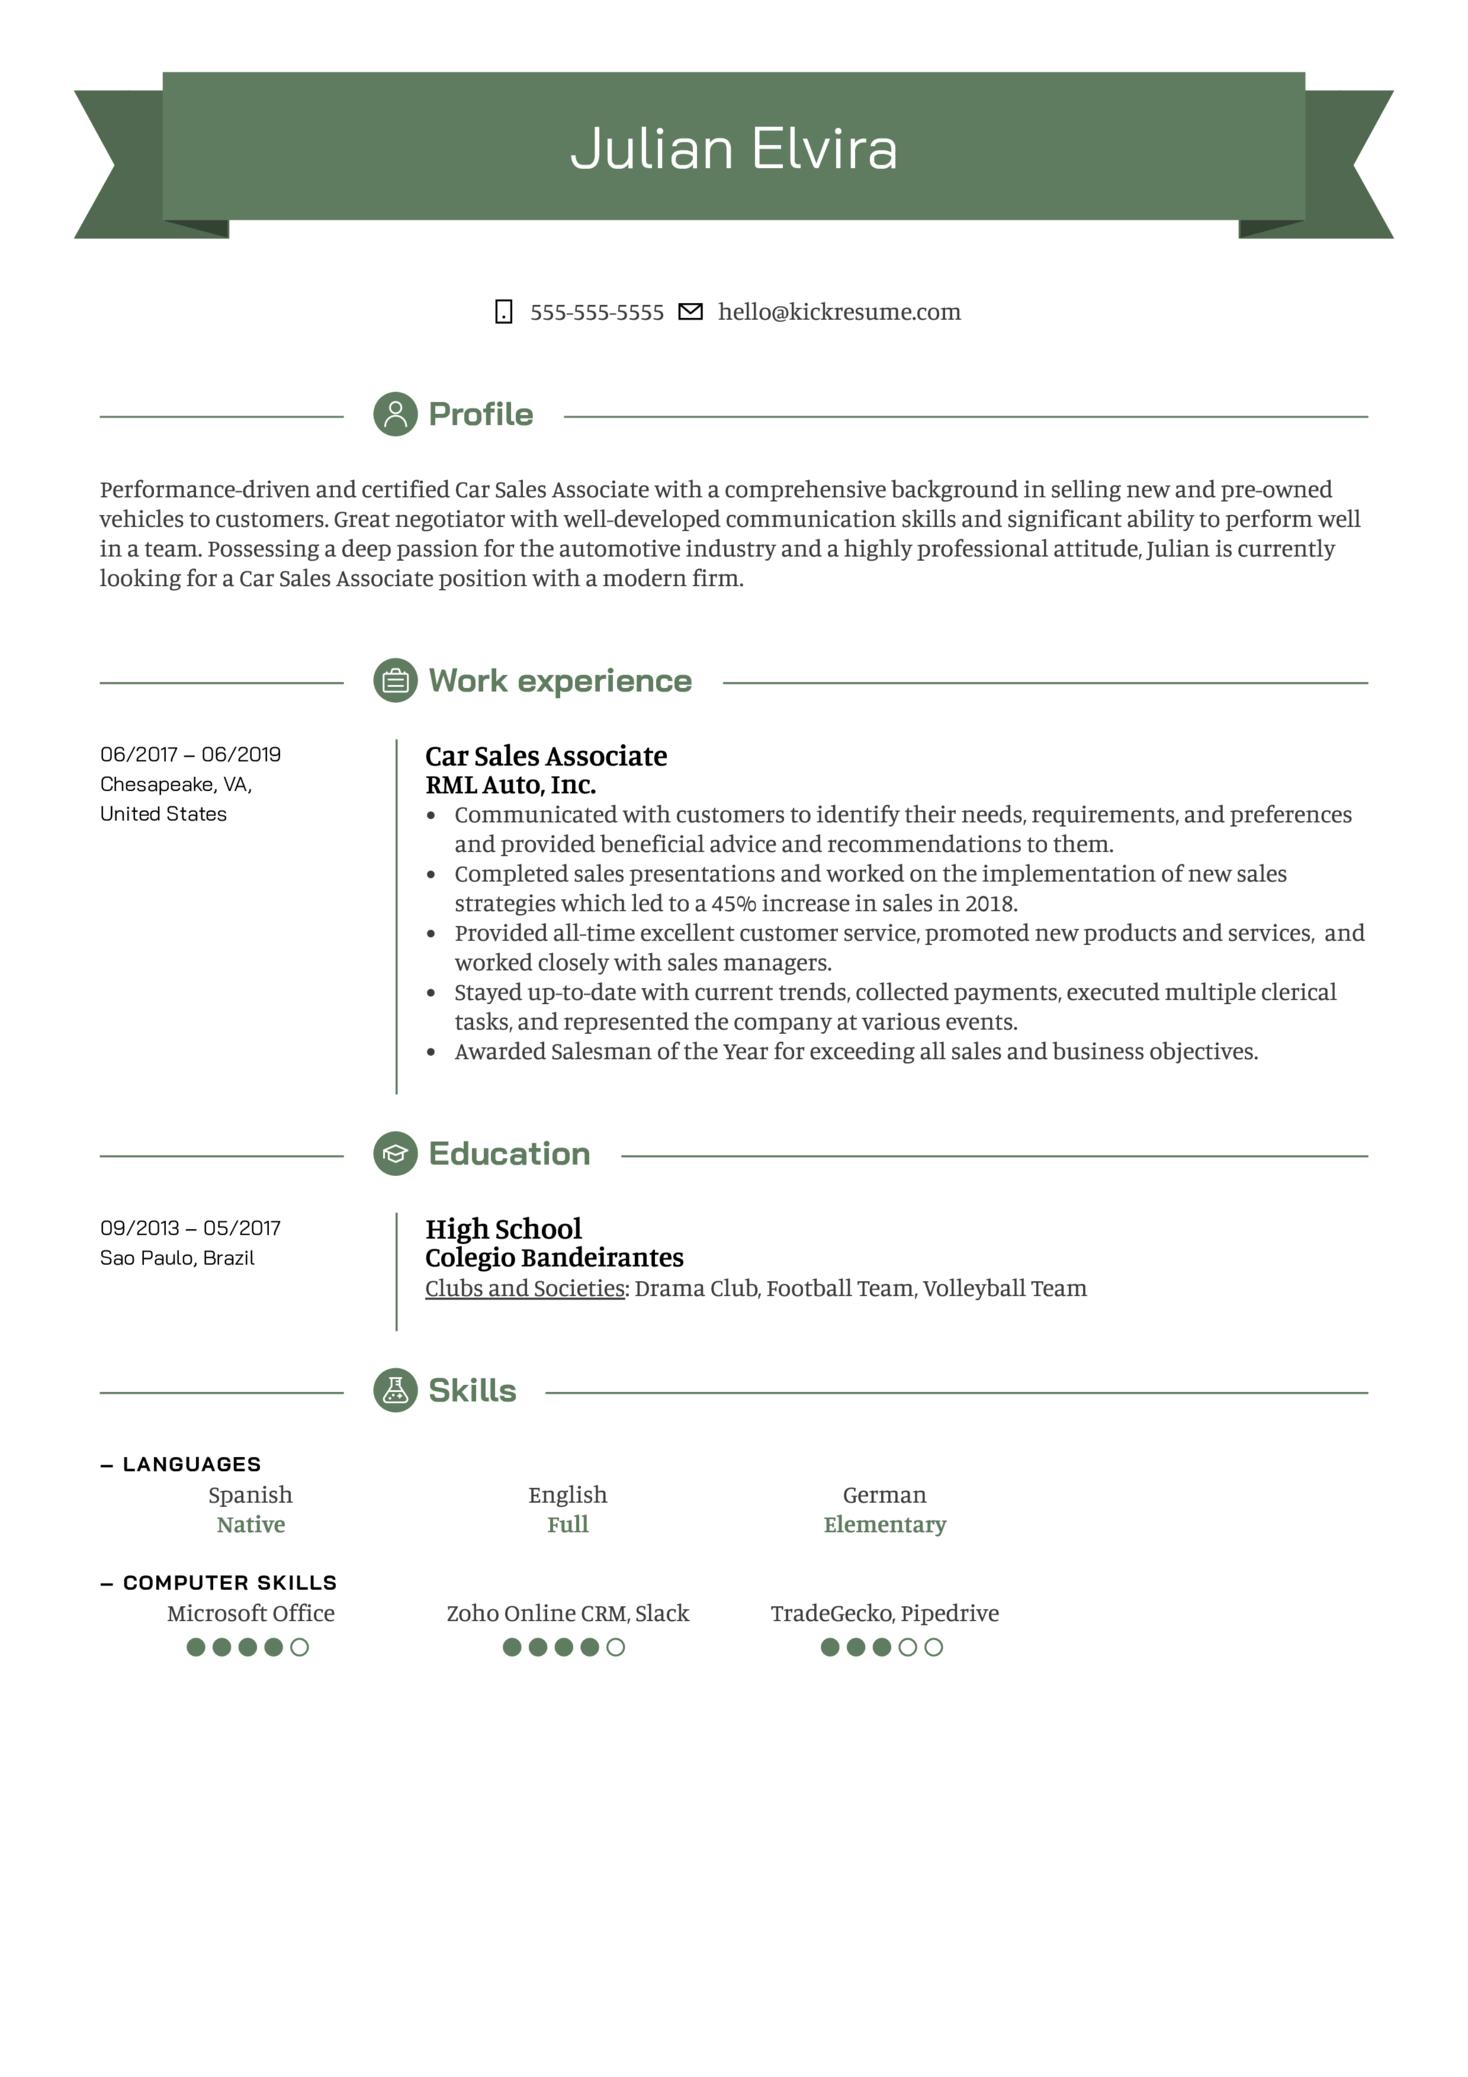 Car Sales Associate Resume Sample (parte 1)